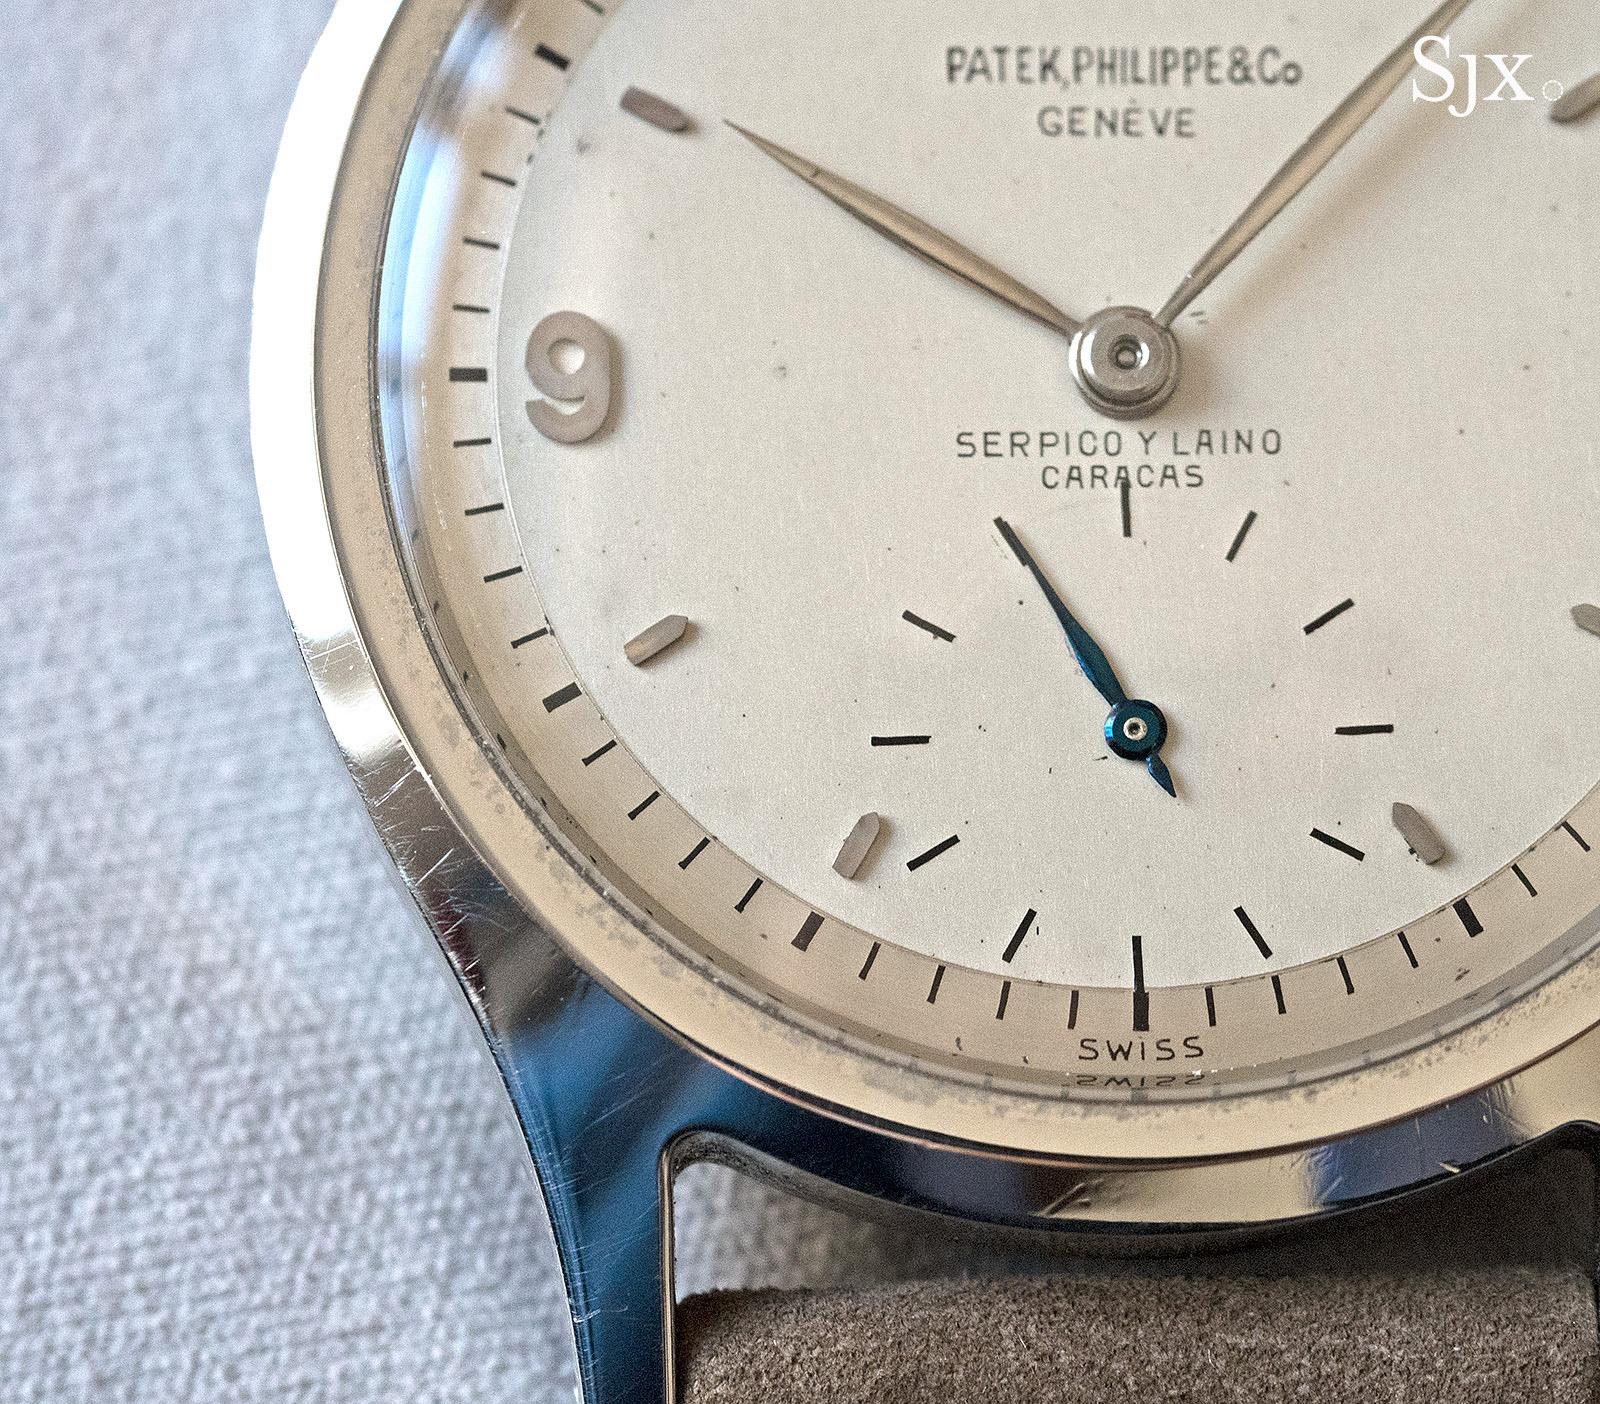 Patek Philppe 565 steel Serpico Laino-4